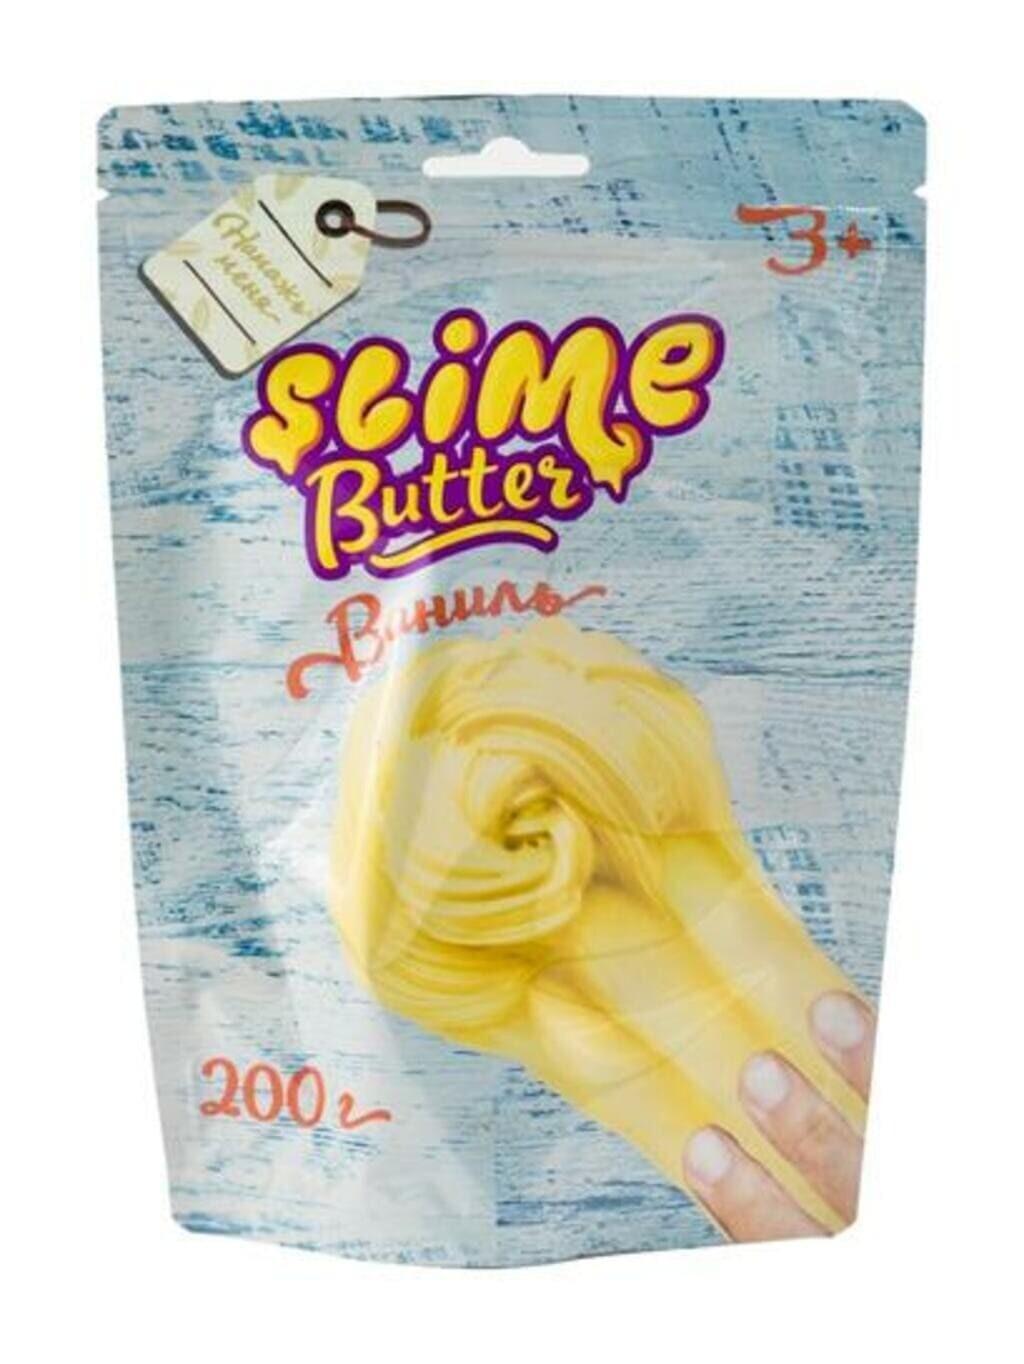 Butter-slime с ароматом ванили, 200 г